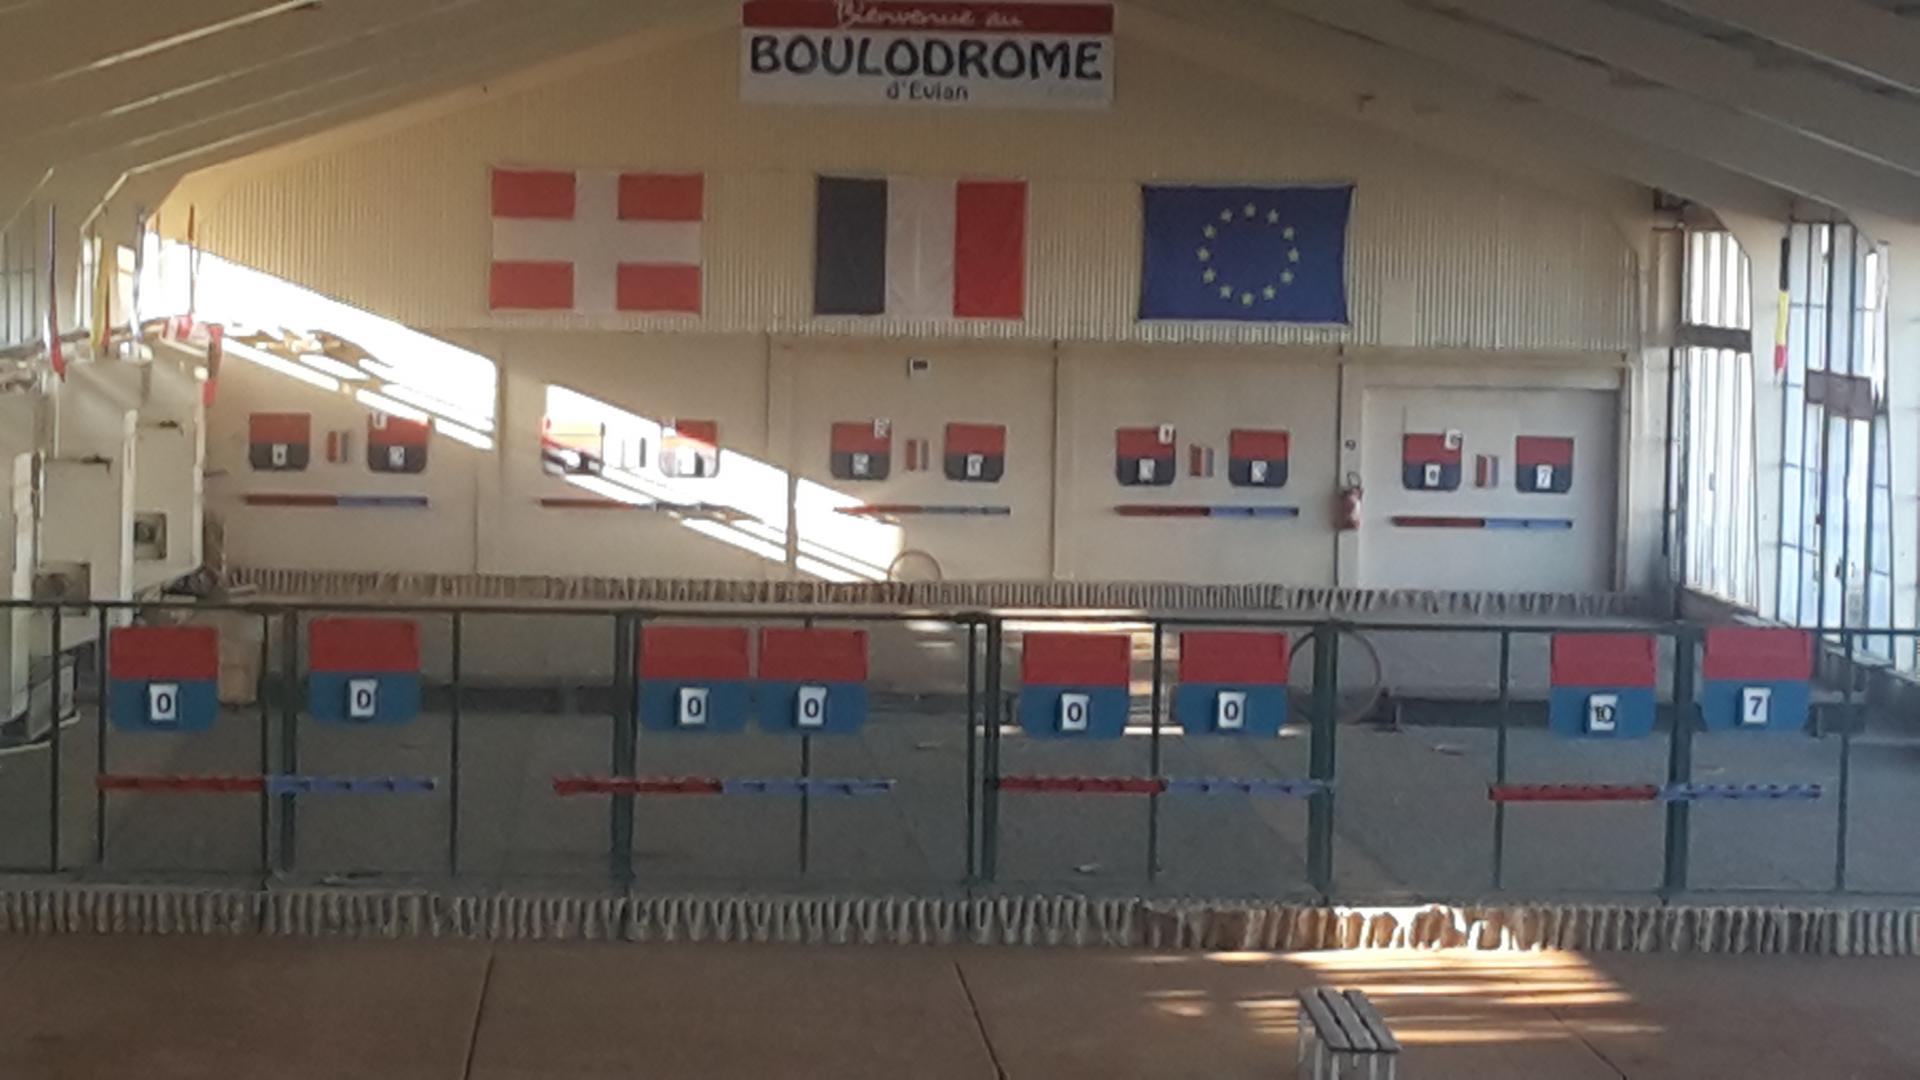 Boulodrome 1